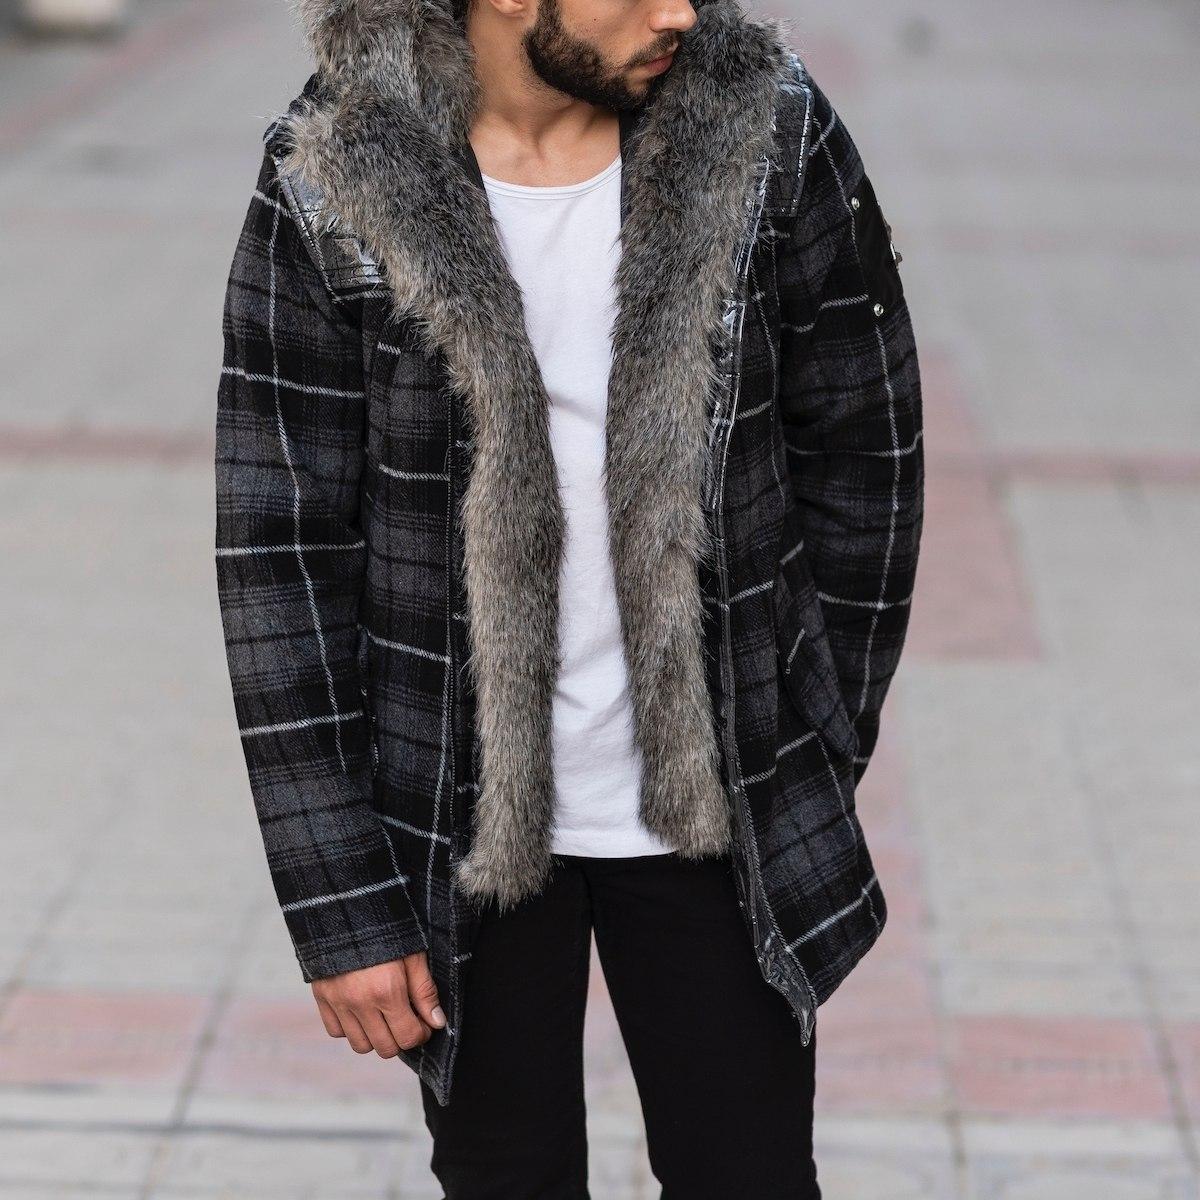 Furry Plaid Jacket With Hood MV Jacket Collection - 3